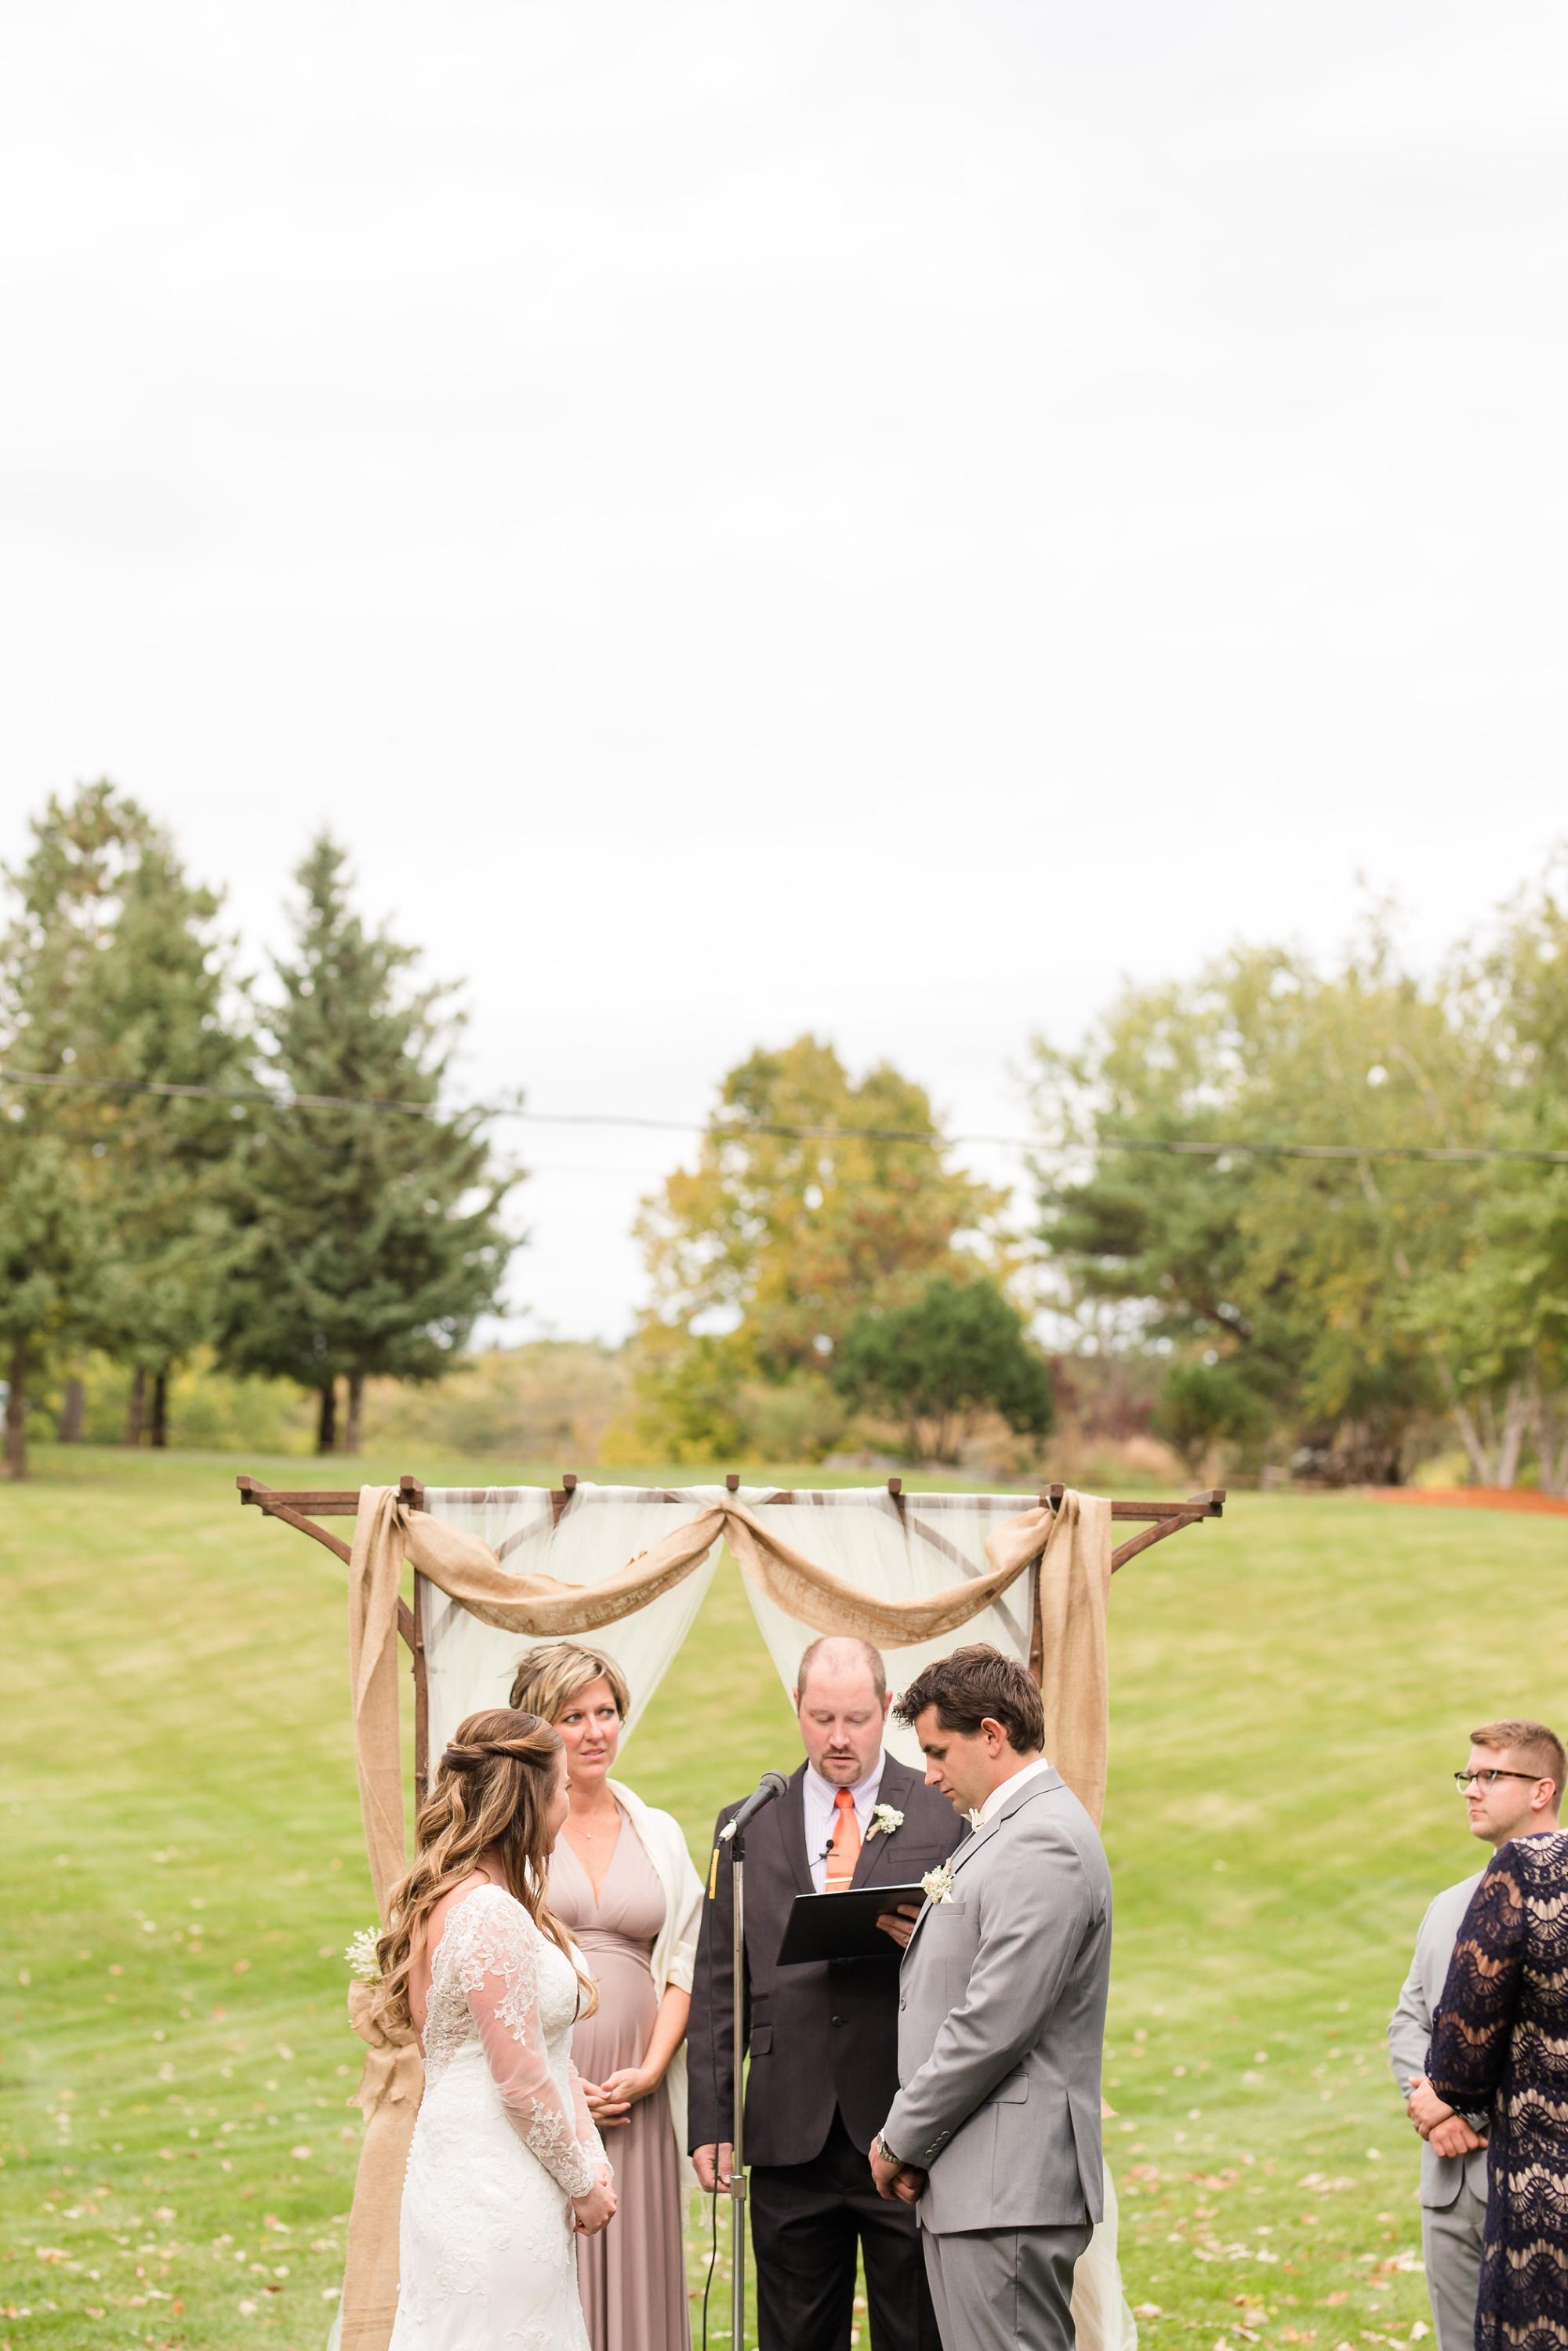 AmberLangerudPhotography_Fair Hills Resort Lakeside Wedding in Minnesota_3462.jpg